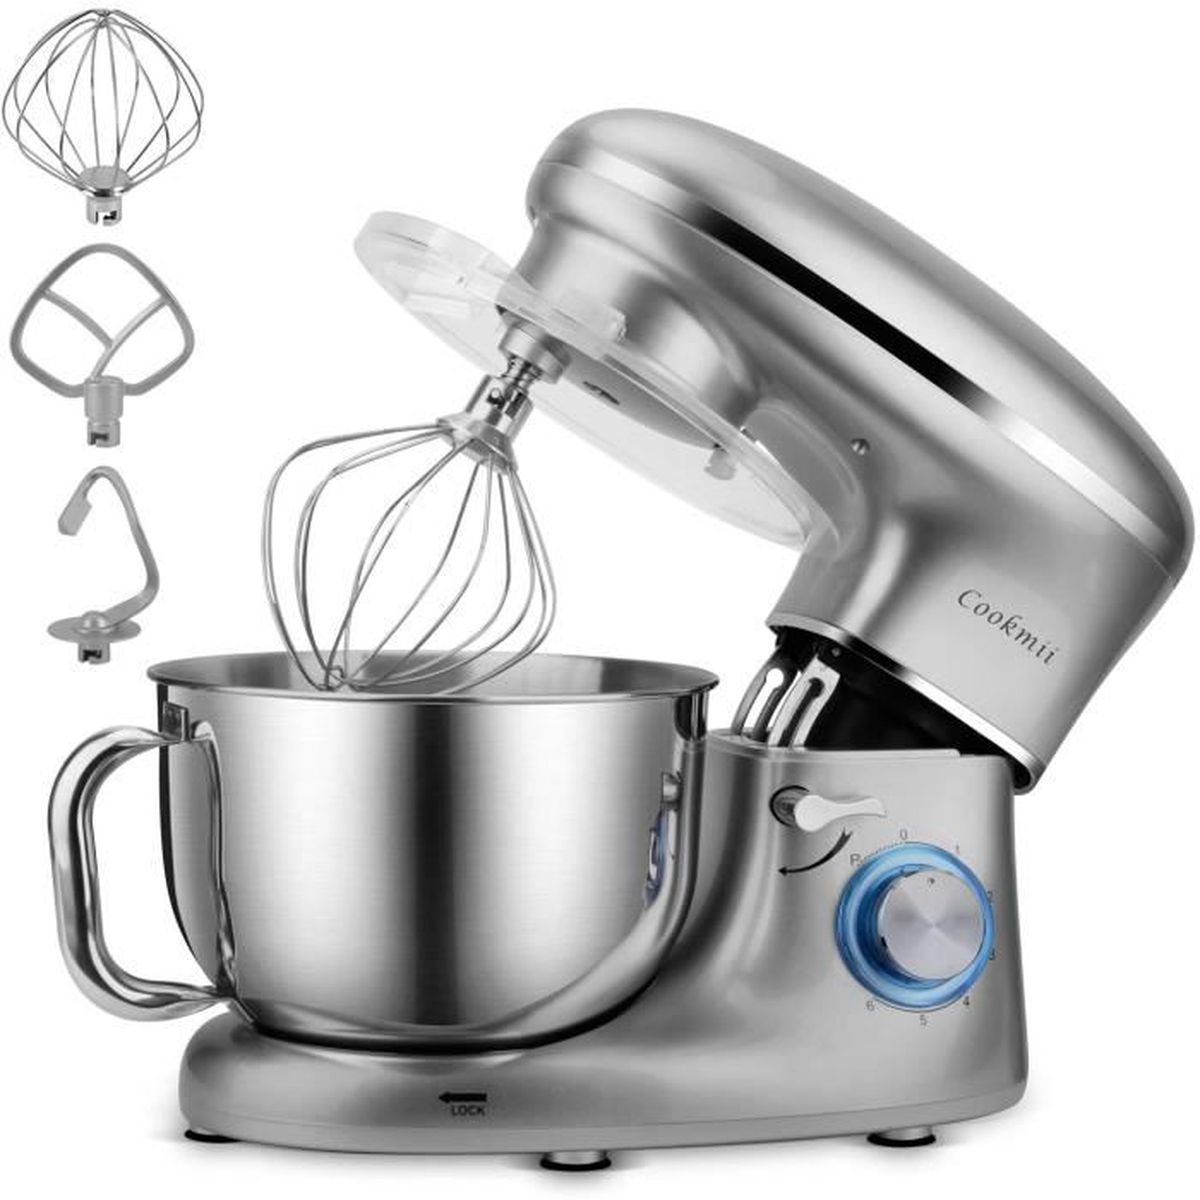 Cookmii Robot Patissier Robot Petrin Robot Cuisine Multifonction